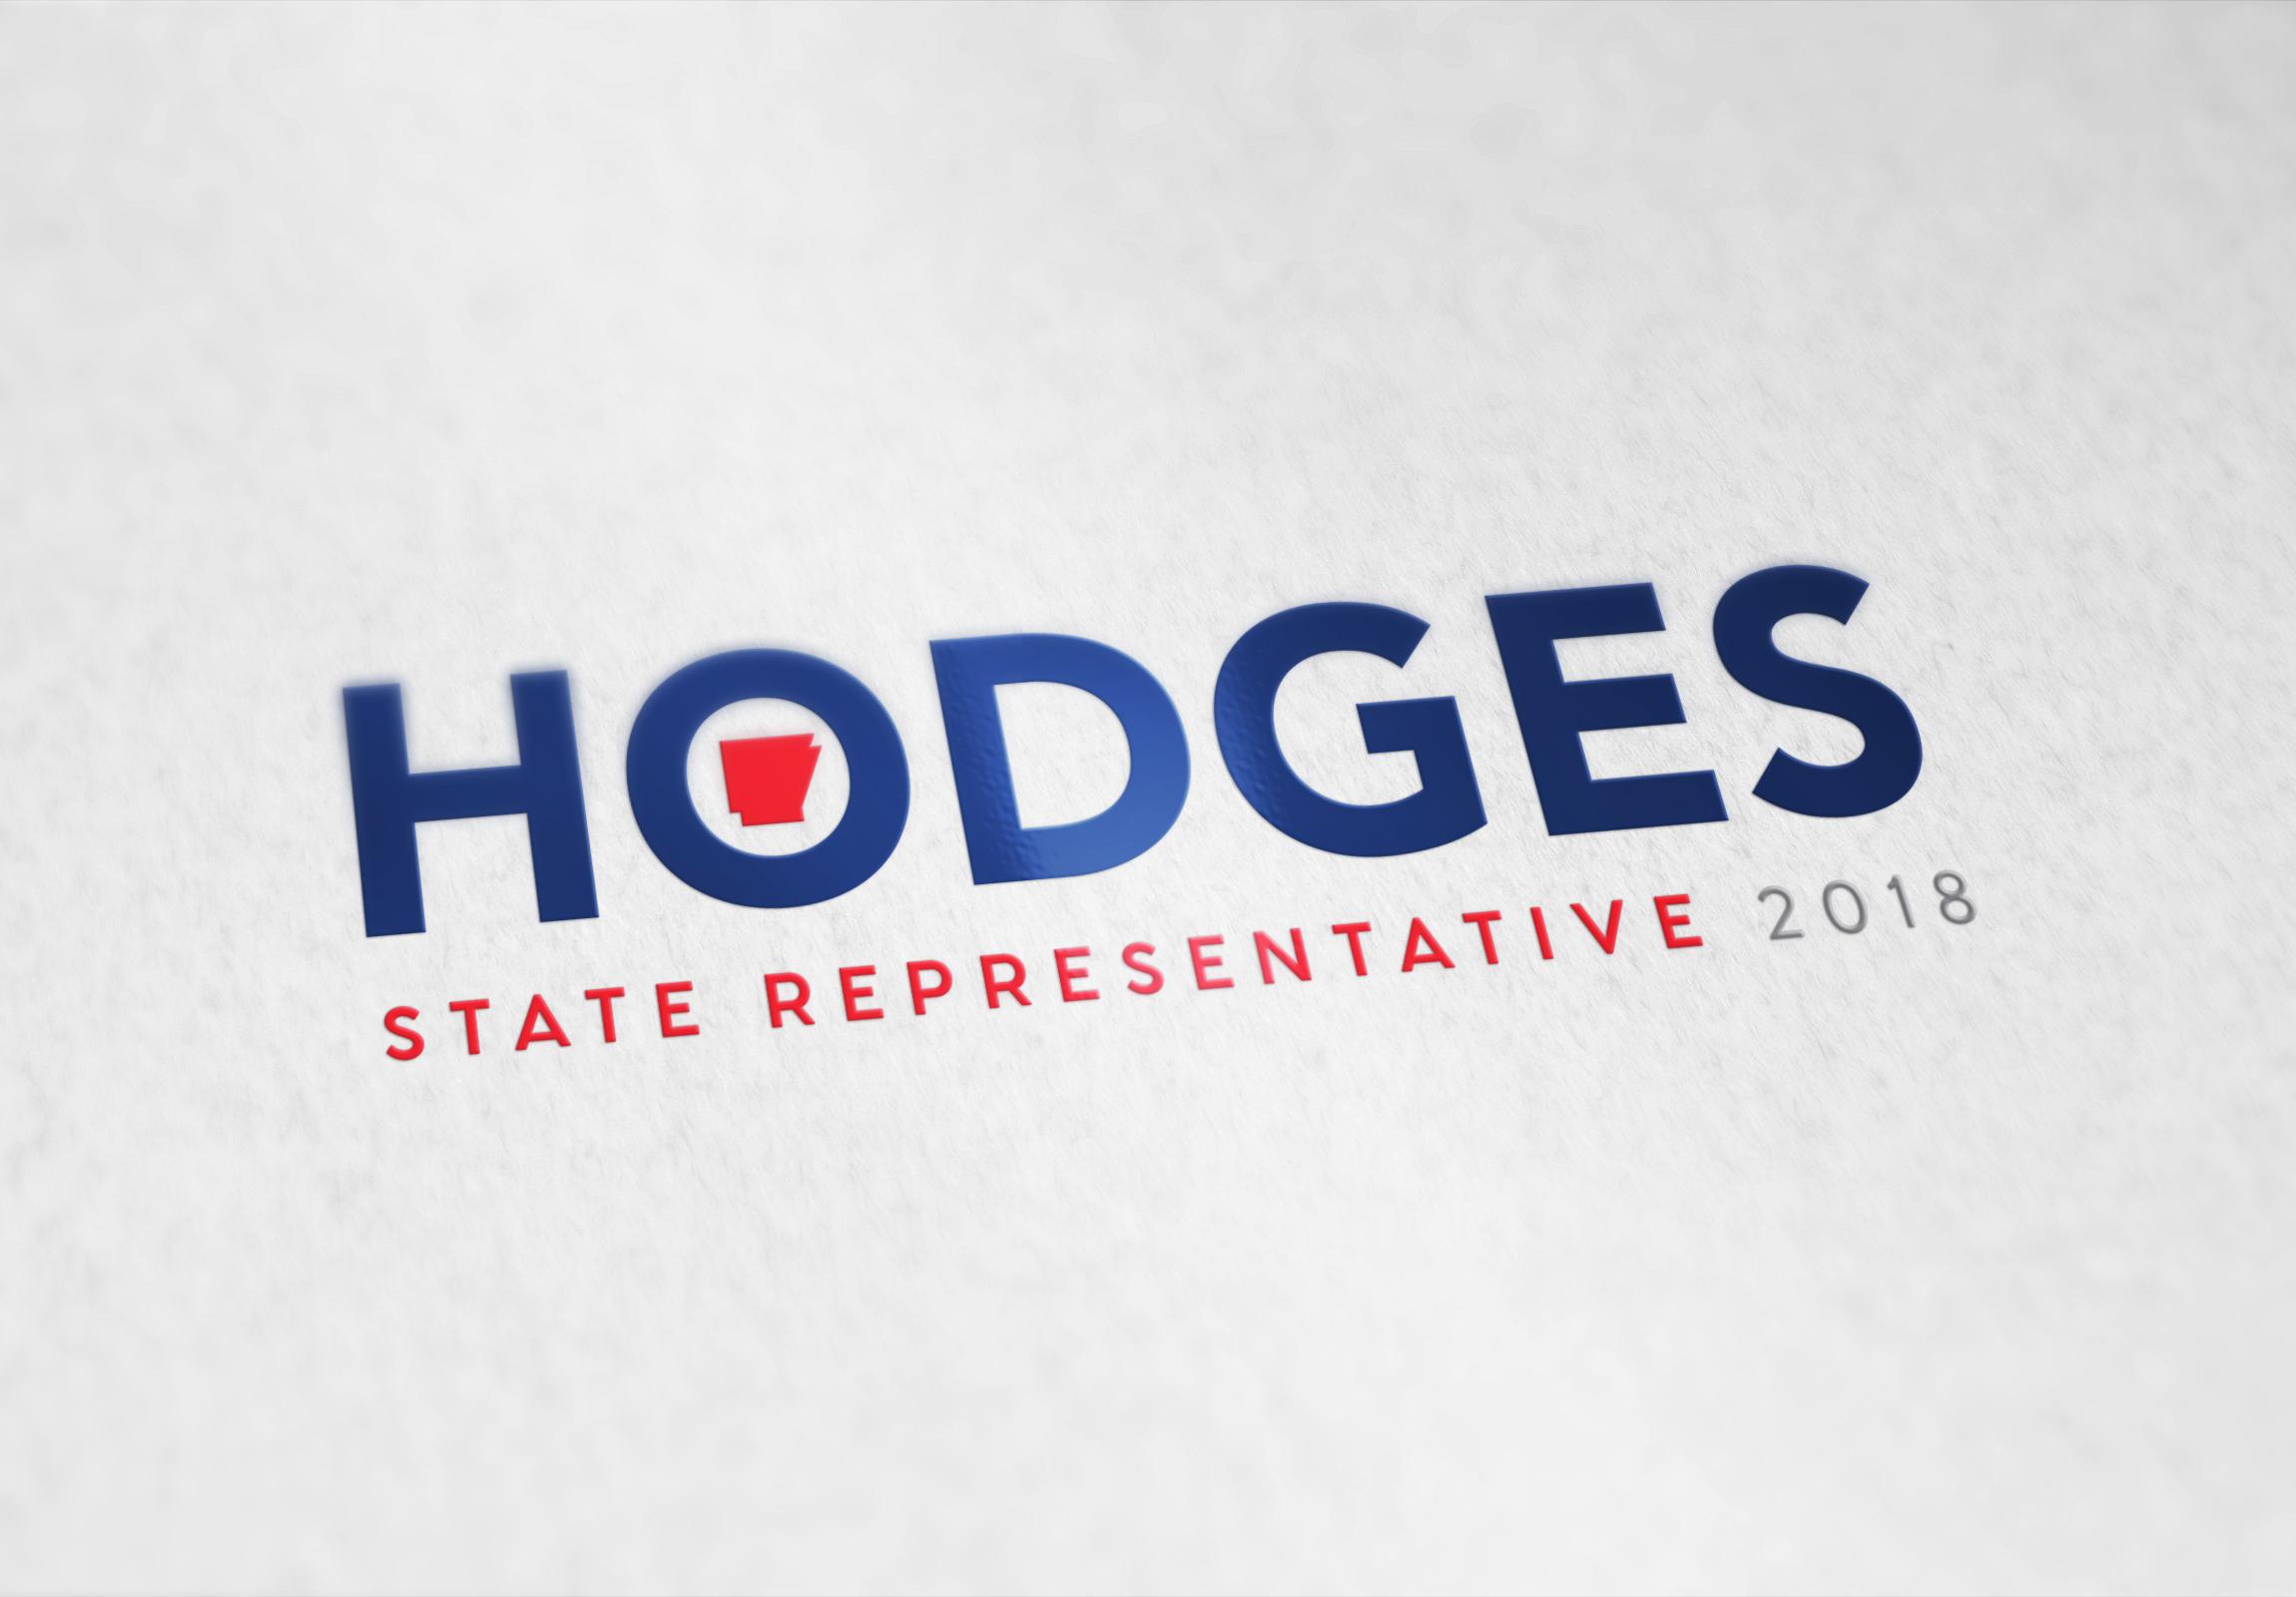 Hodges State Representative